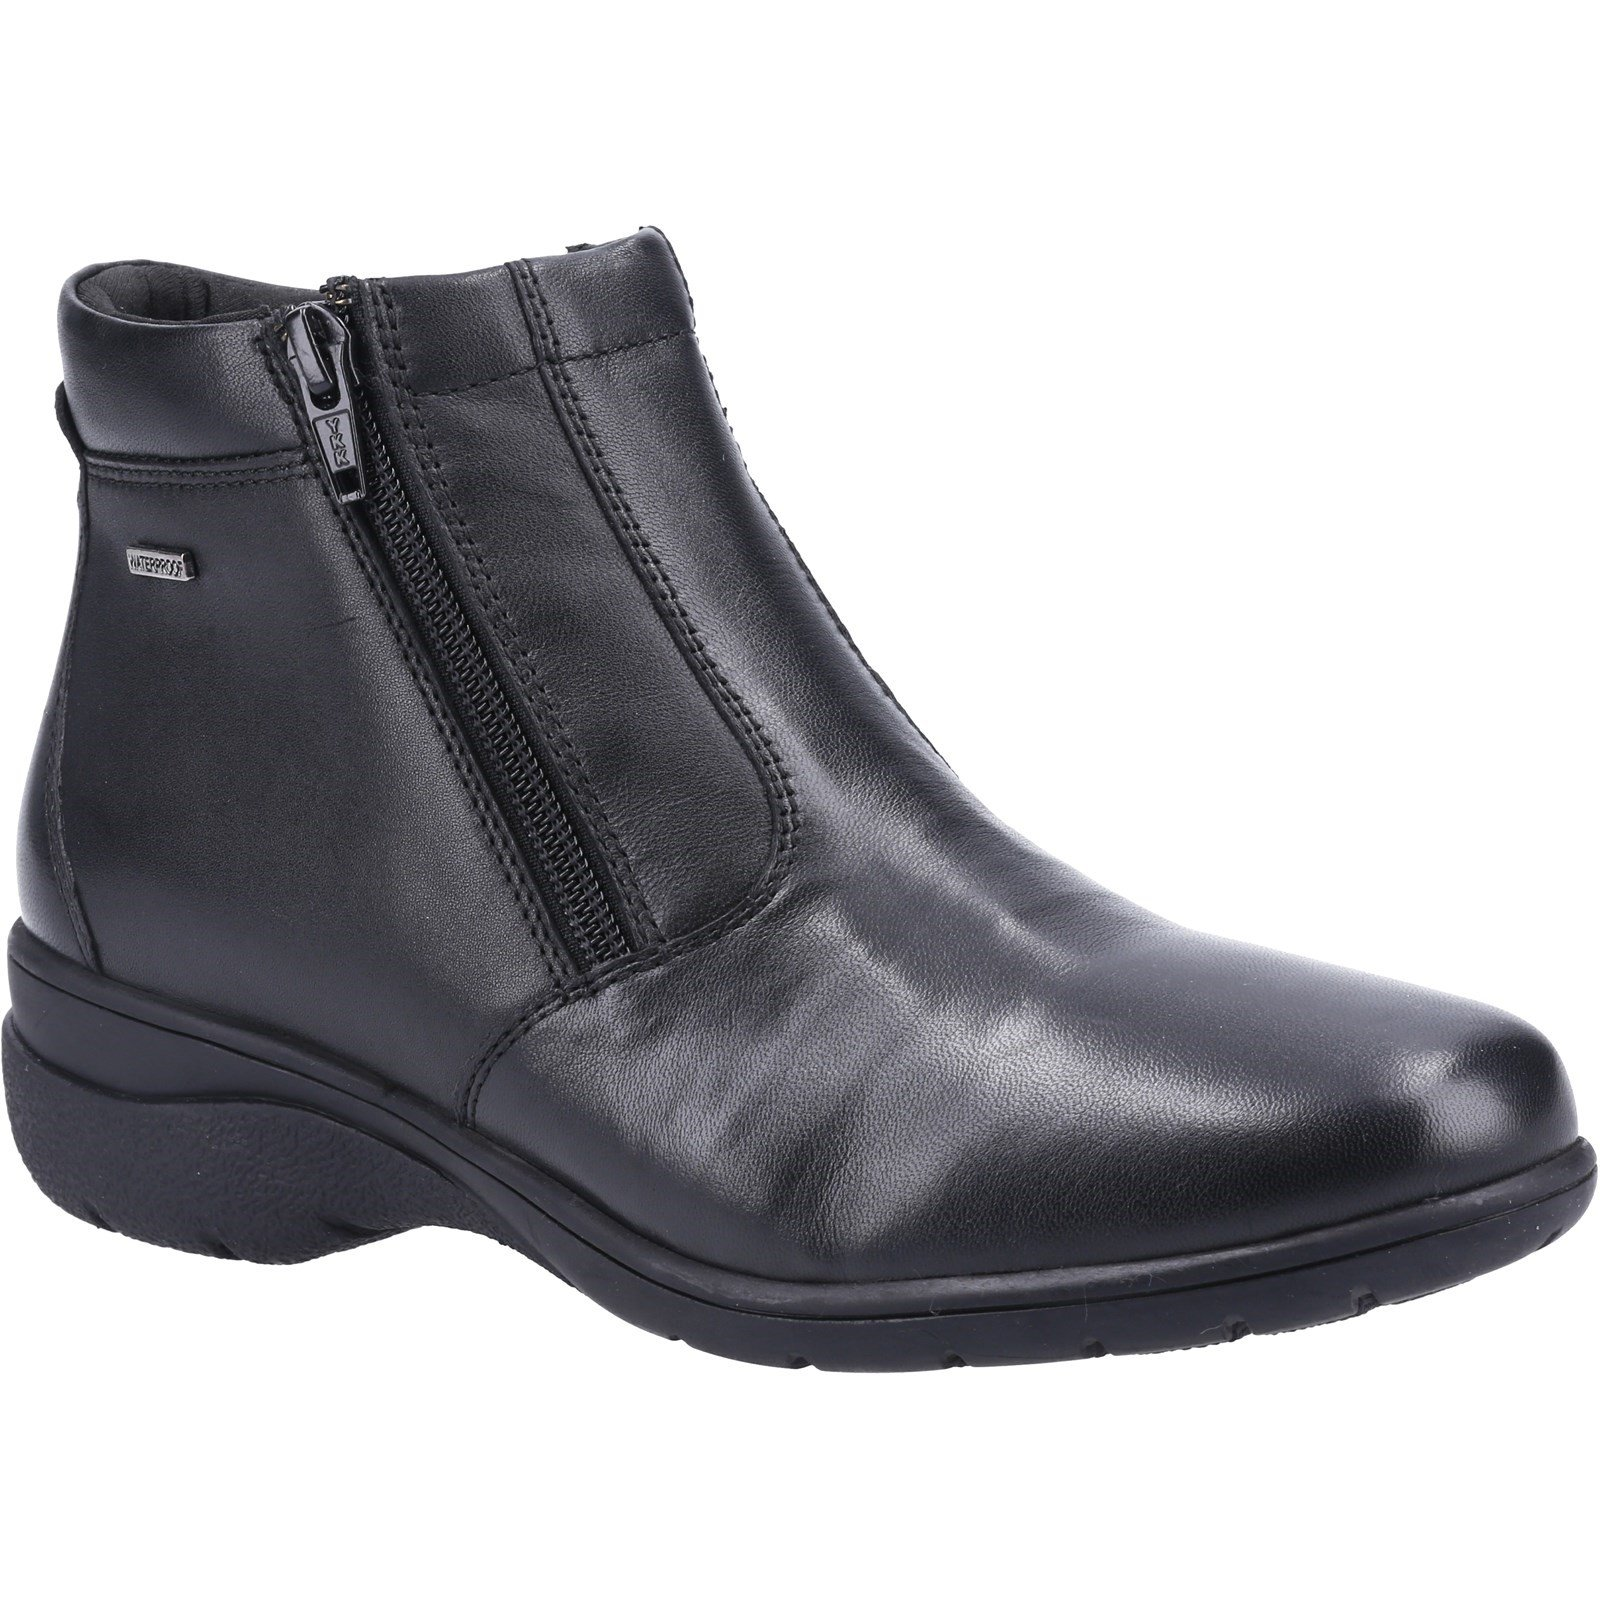 Cotswold Women's Deerhurst Waterproof Boot Black - Black 7